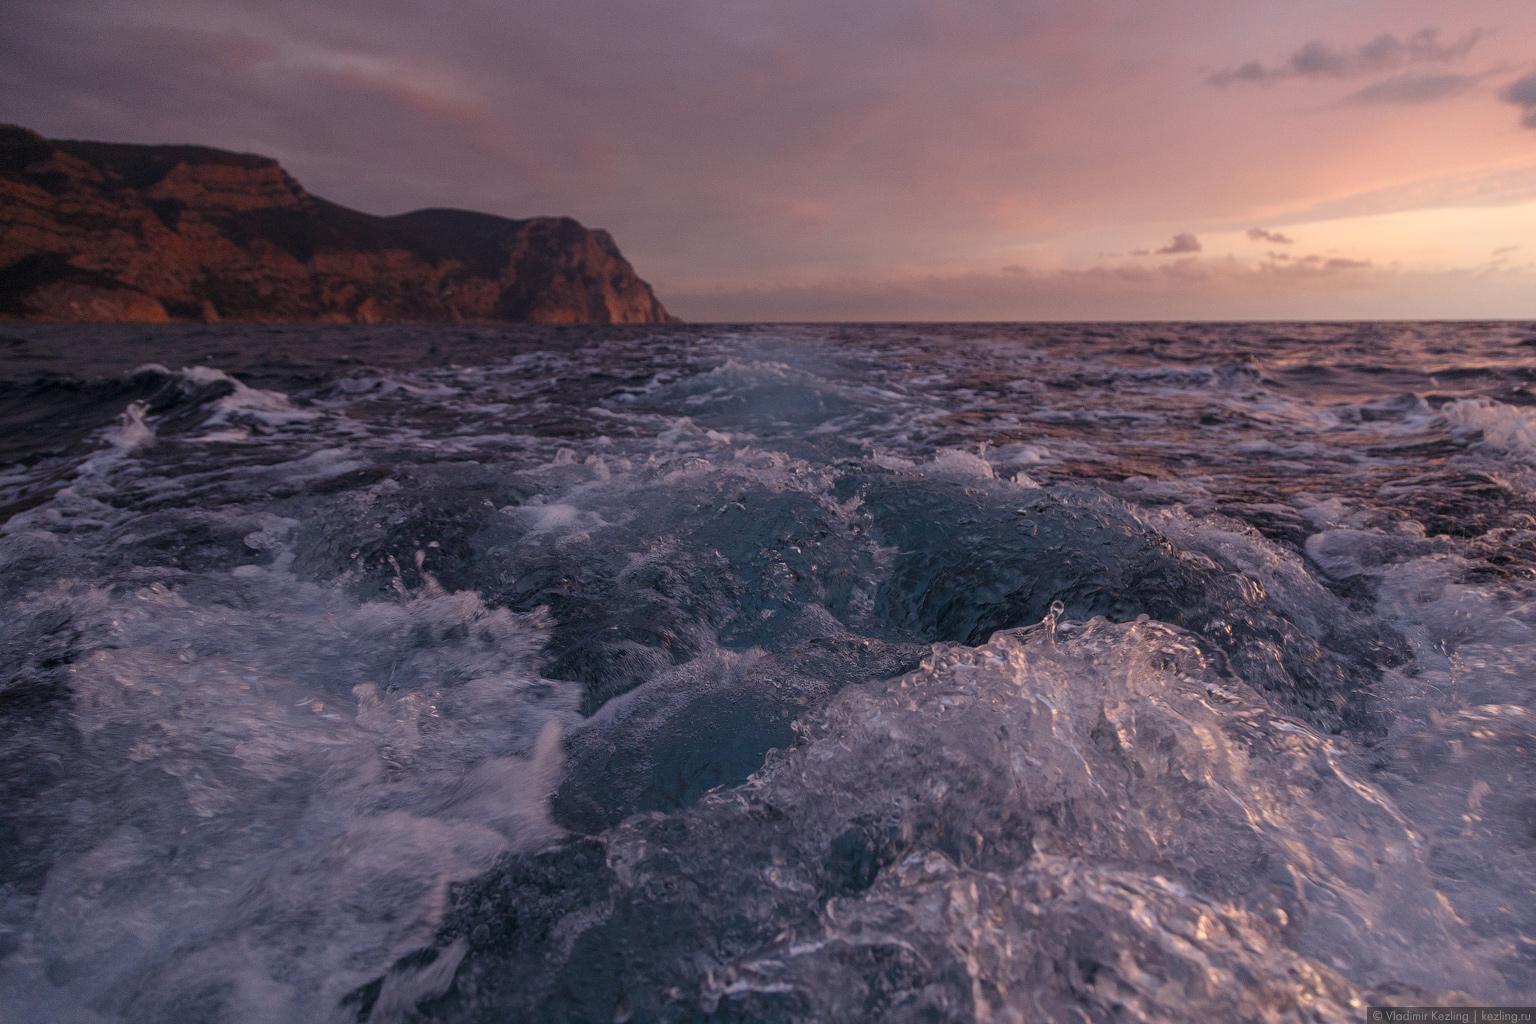 И снова Крым. Морская прогулка на закате из Балаклавы до мыса Айя